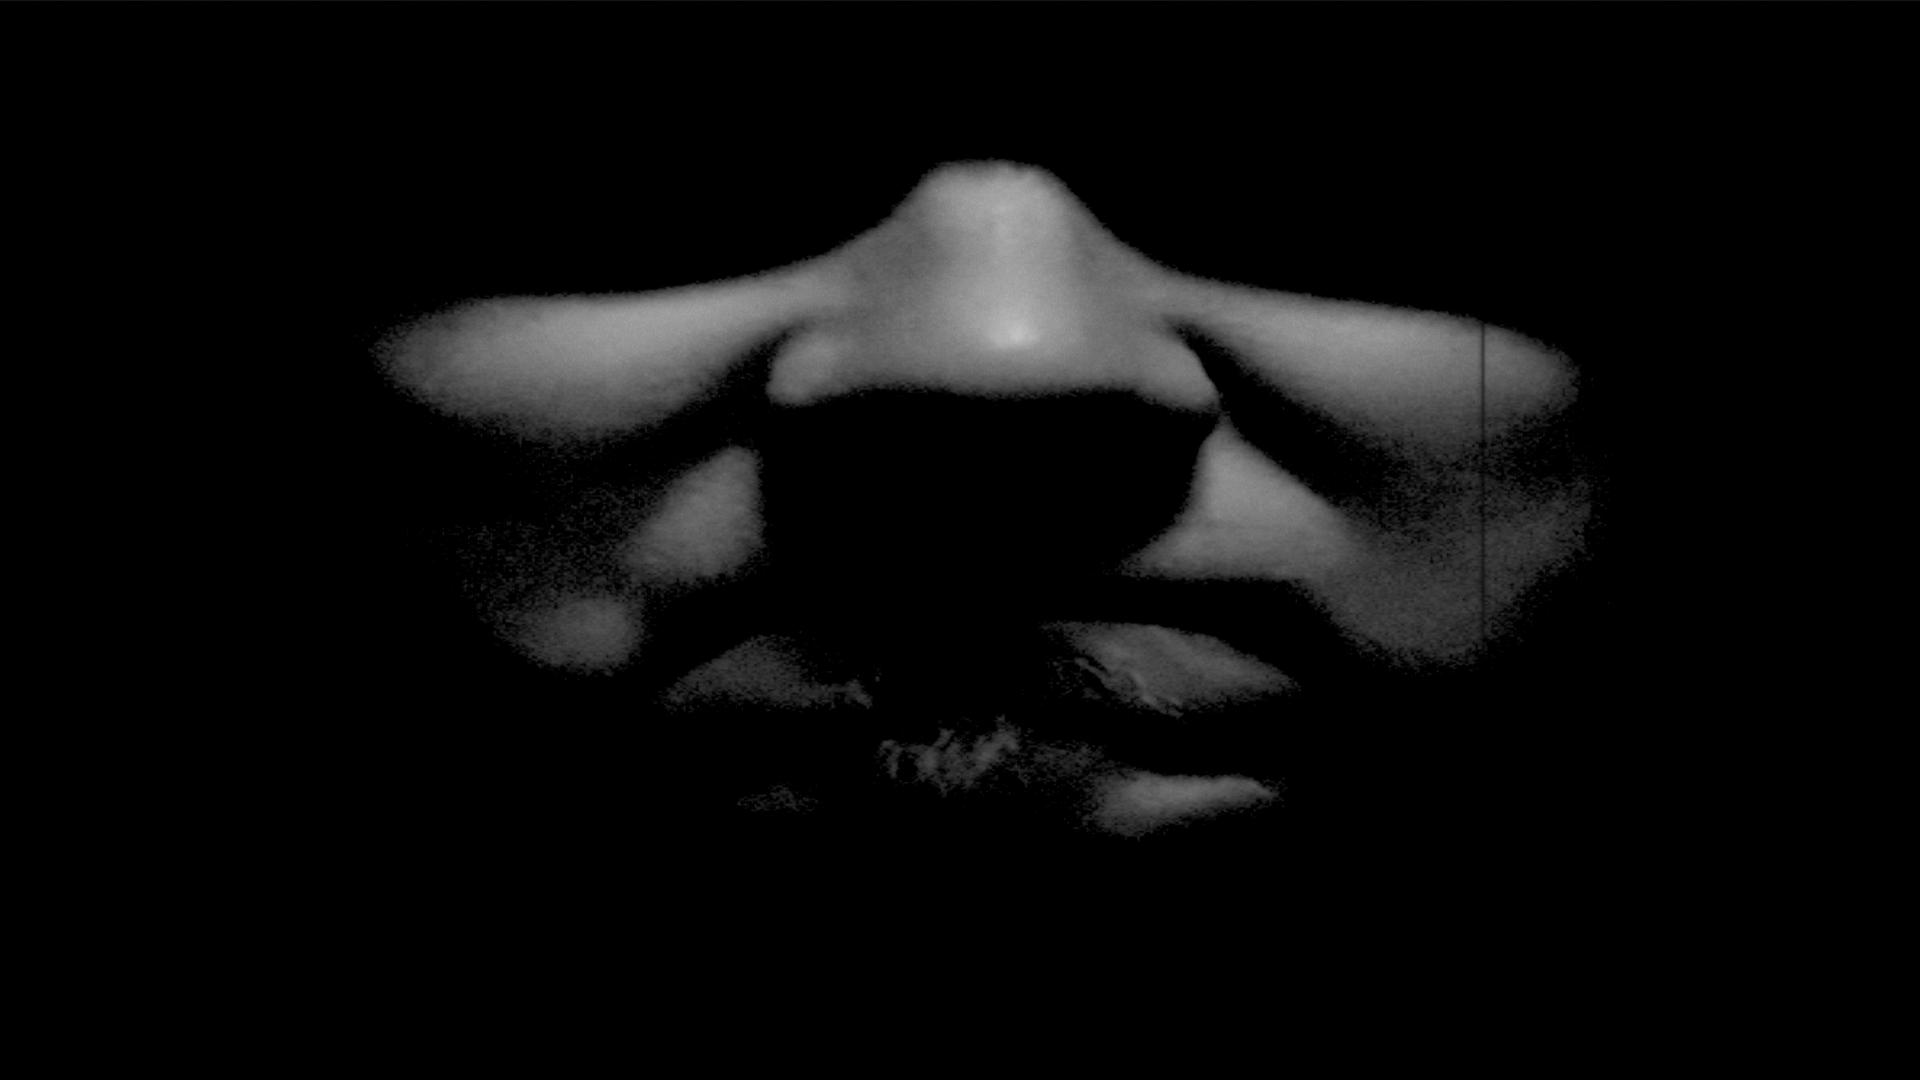 BLACK ACID WORLD – DIGISINGLE OUT ON MAY 29, 2020!